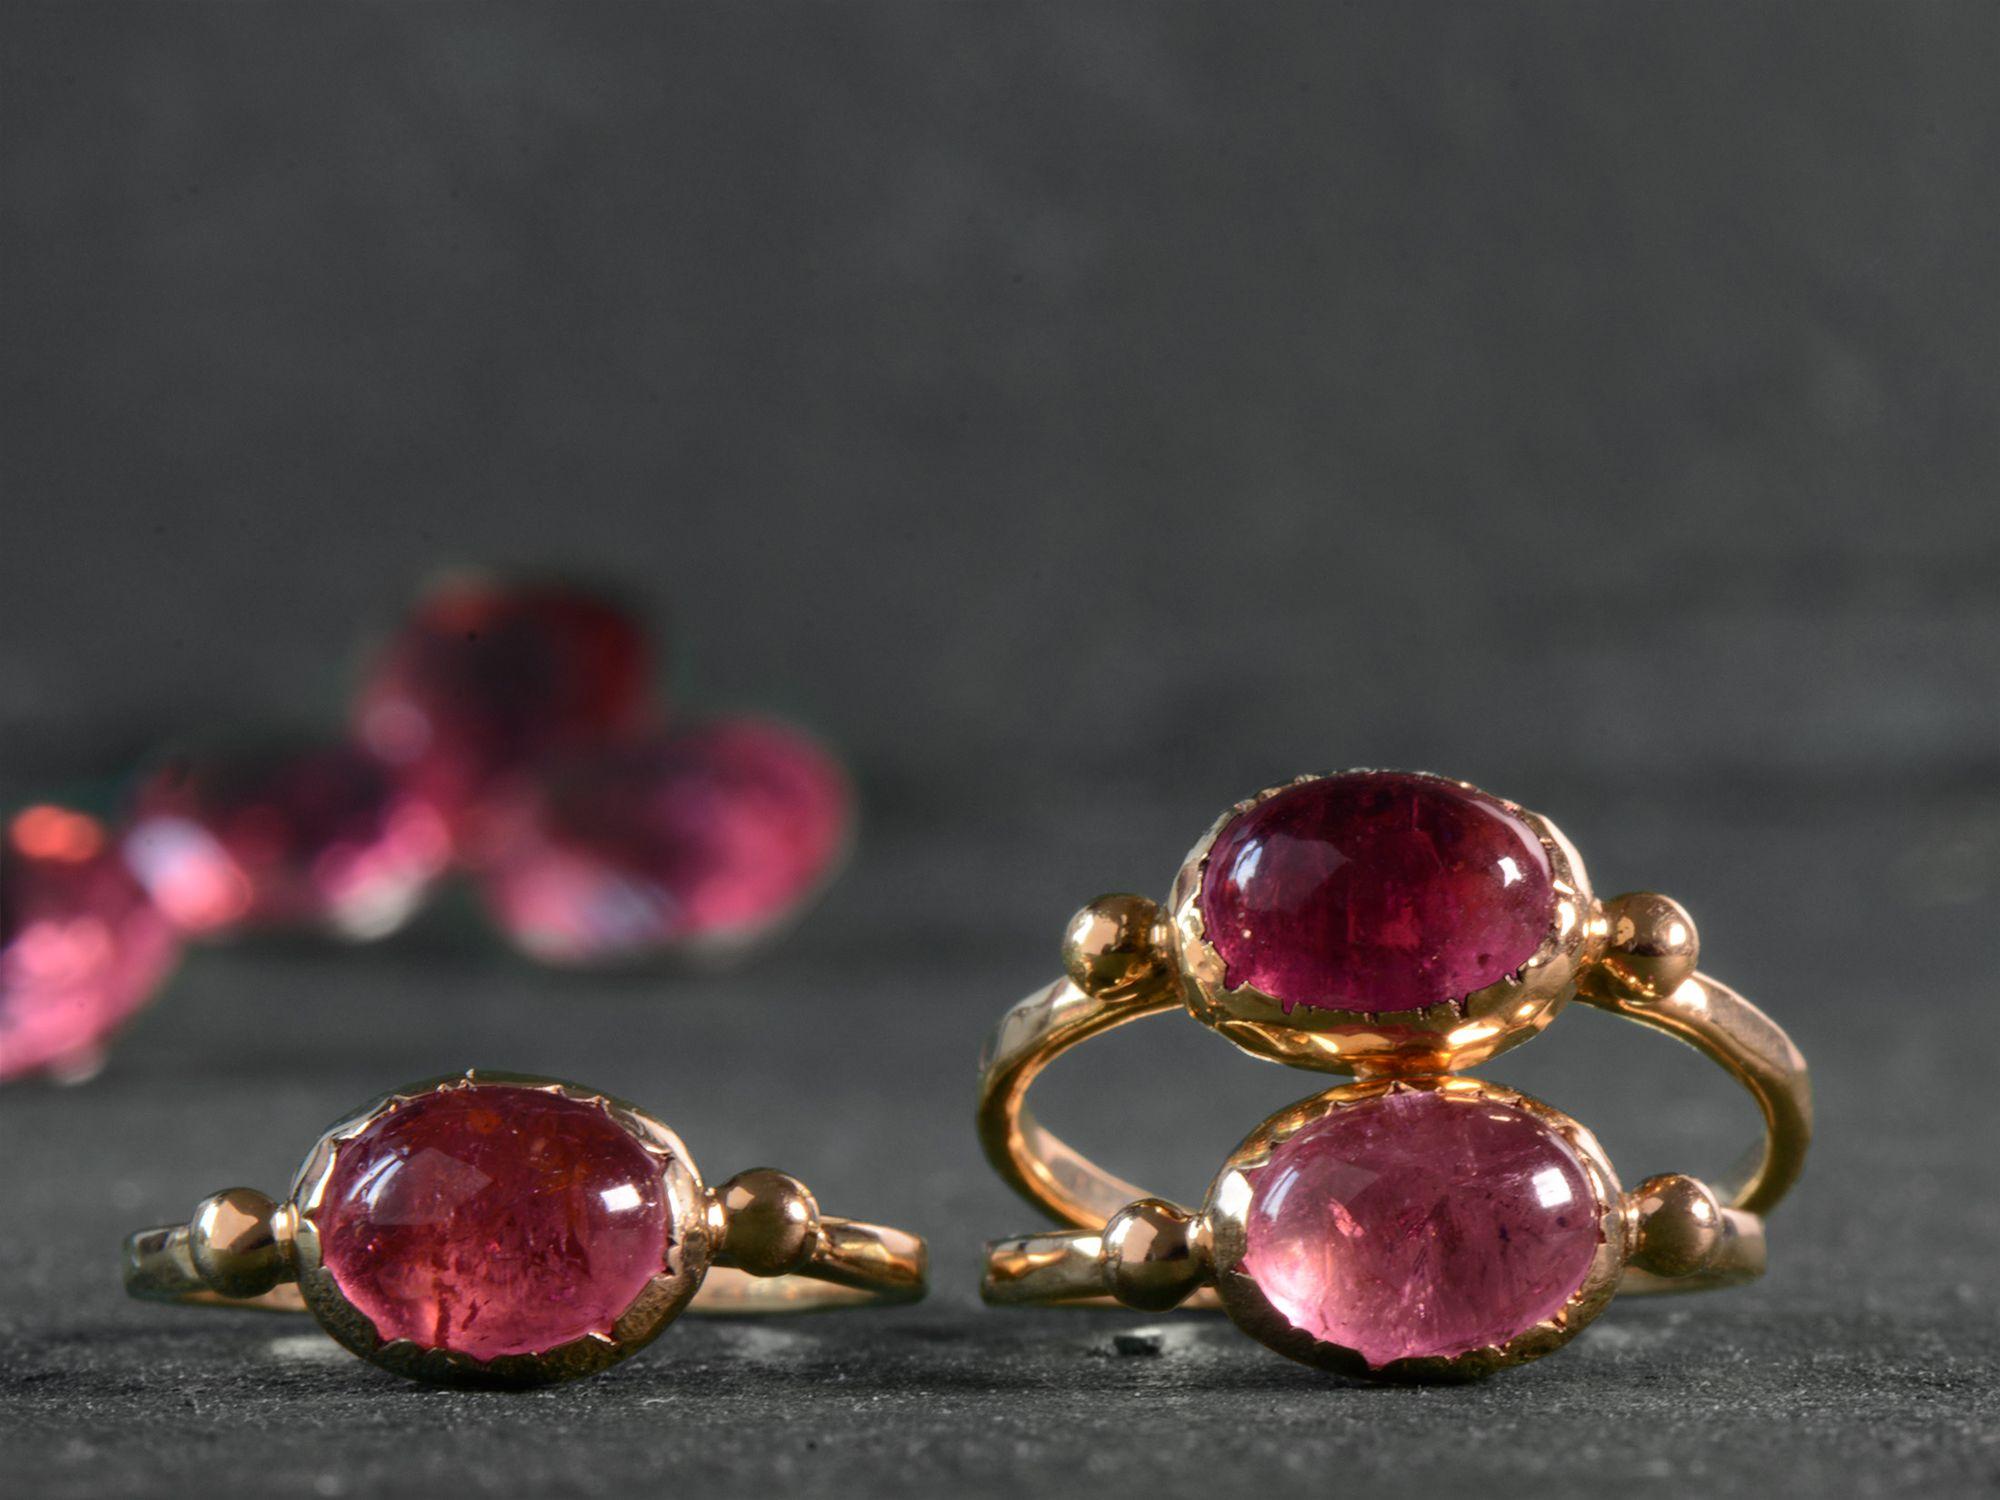 Brunehilde vermeil pink tourmaline rings by Emmanuelle Zysman